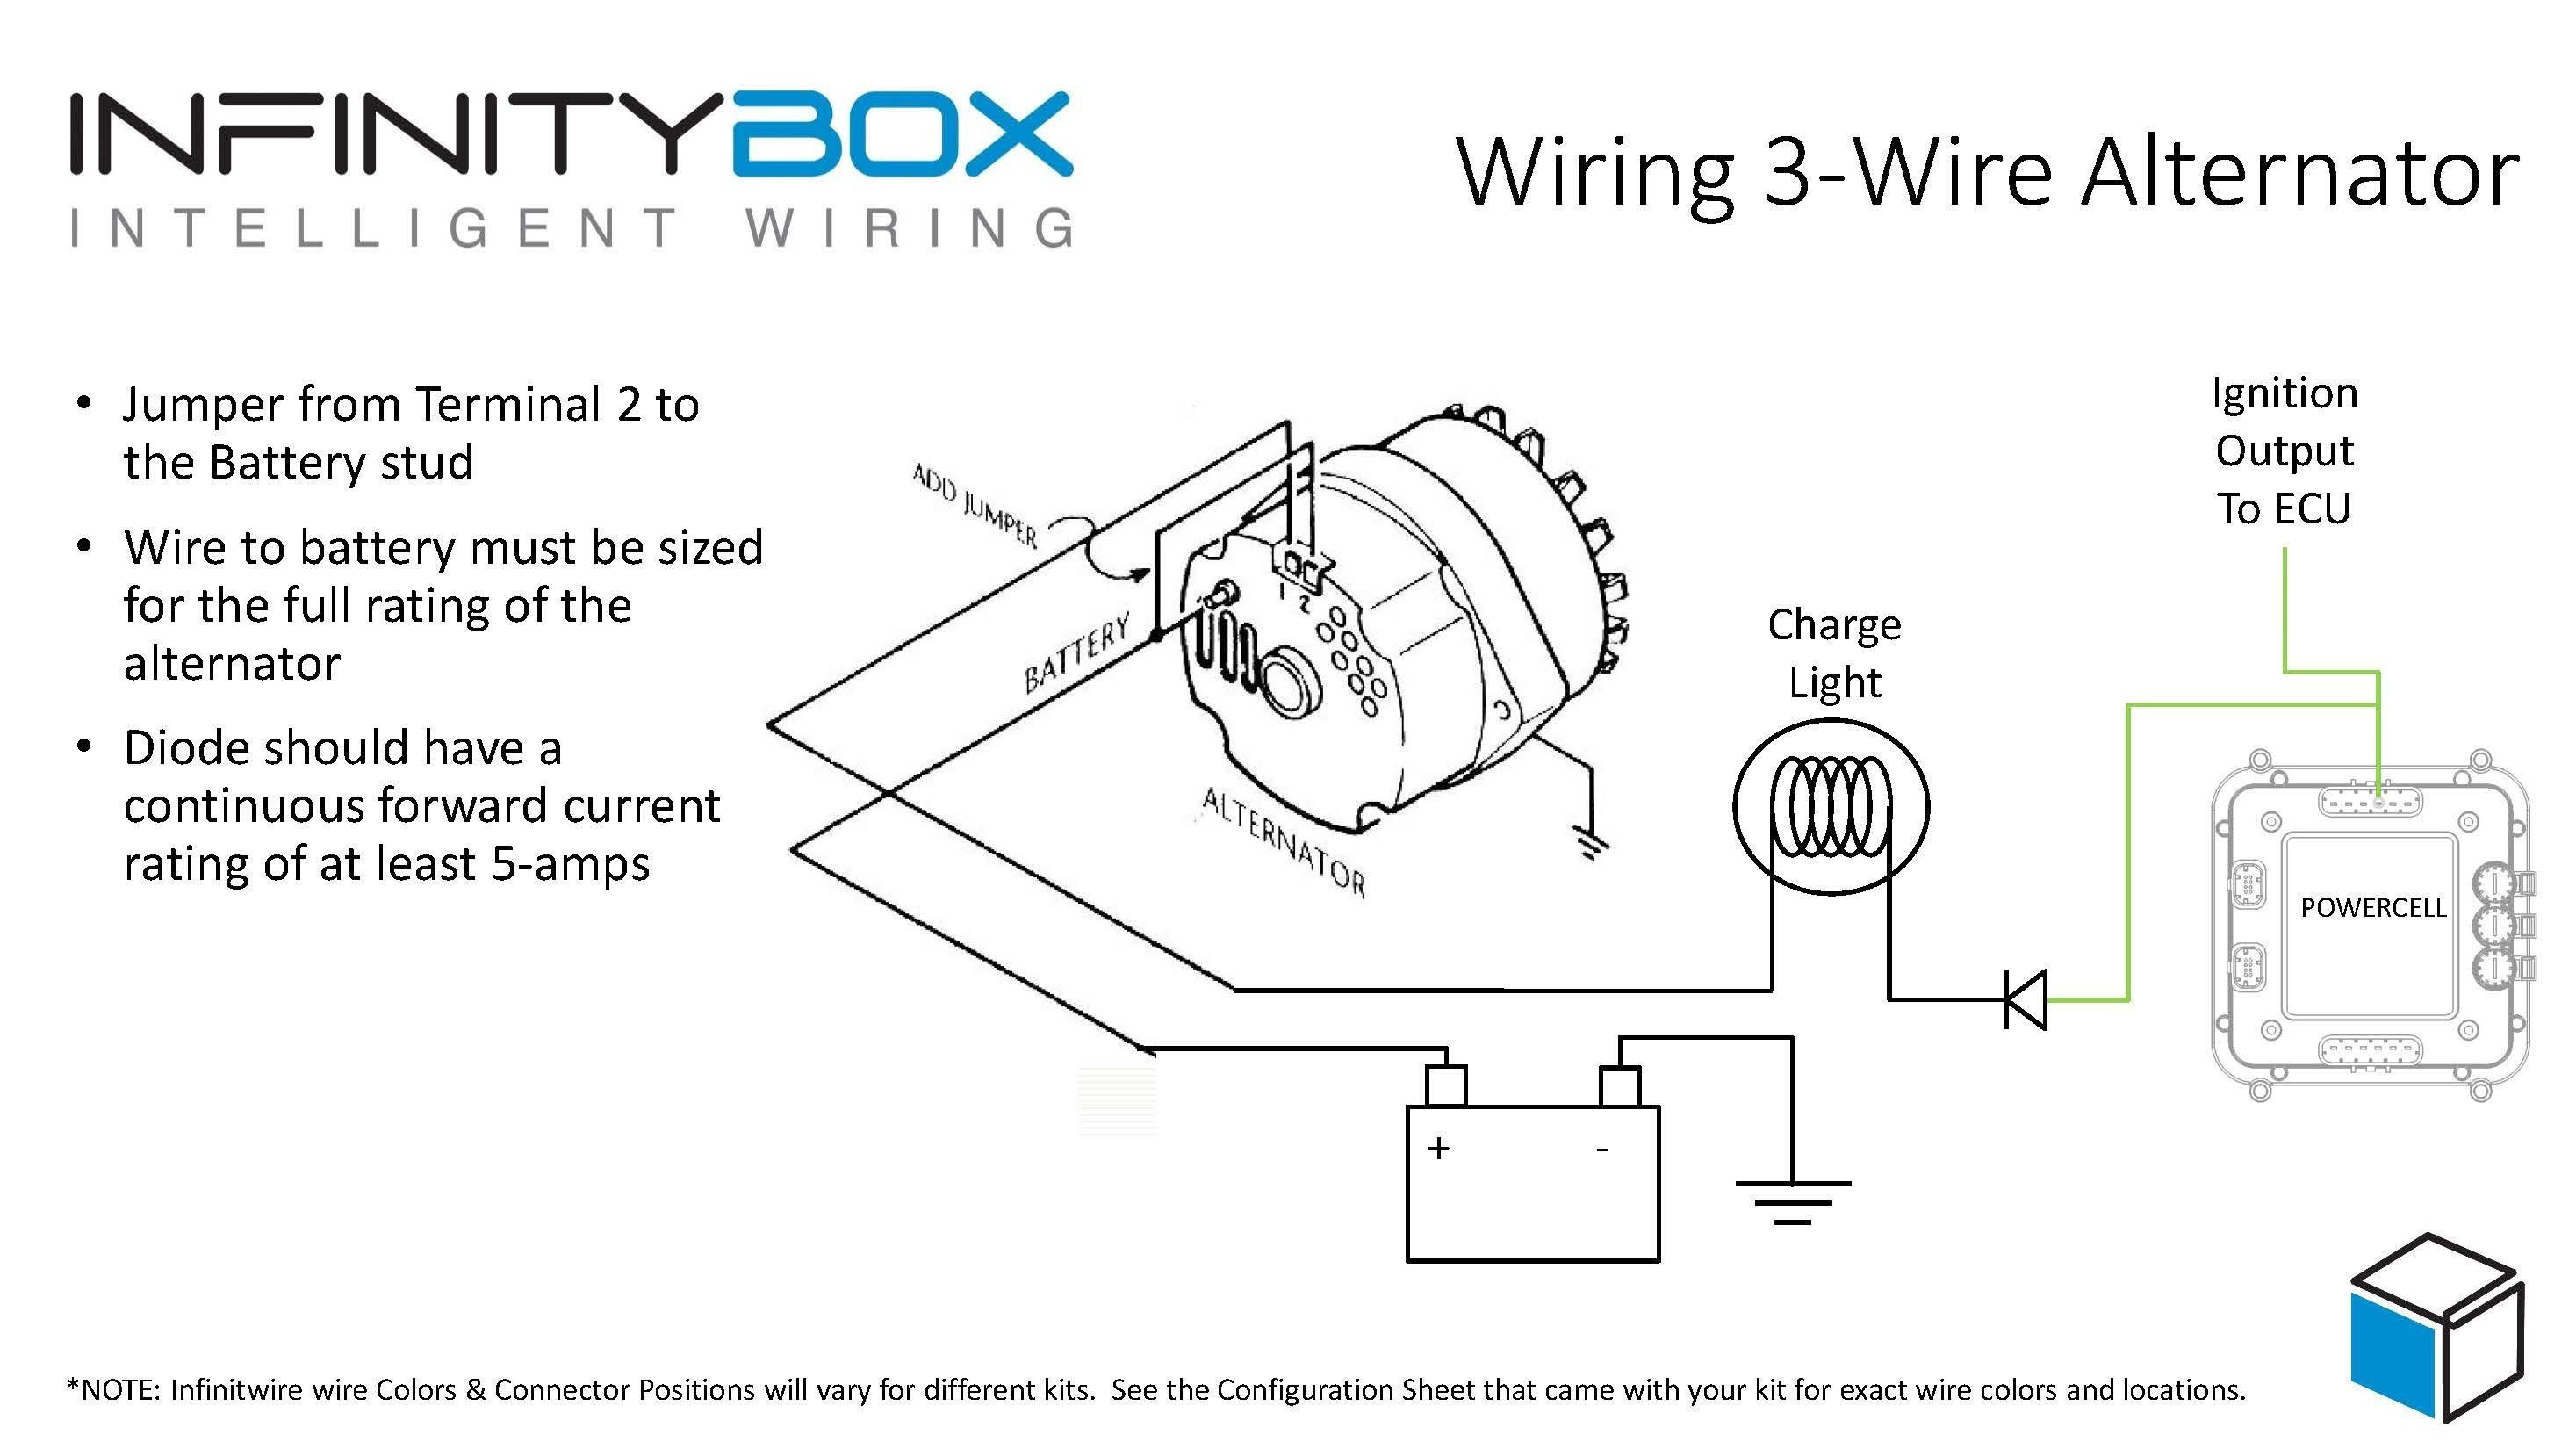 3 Wire Alternator Wiring Diagram Awesome 3 Wire Alternator Wiring Diagram Diagram Of 3 Wire Alternator Wiring Diagram